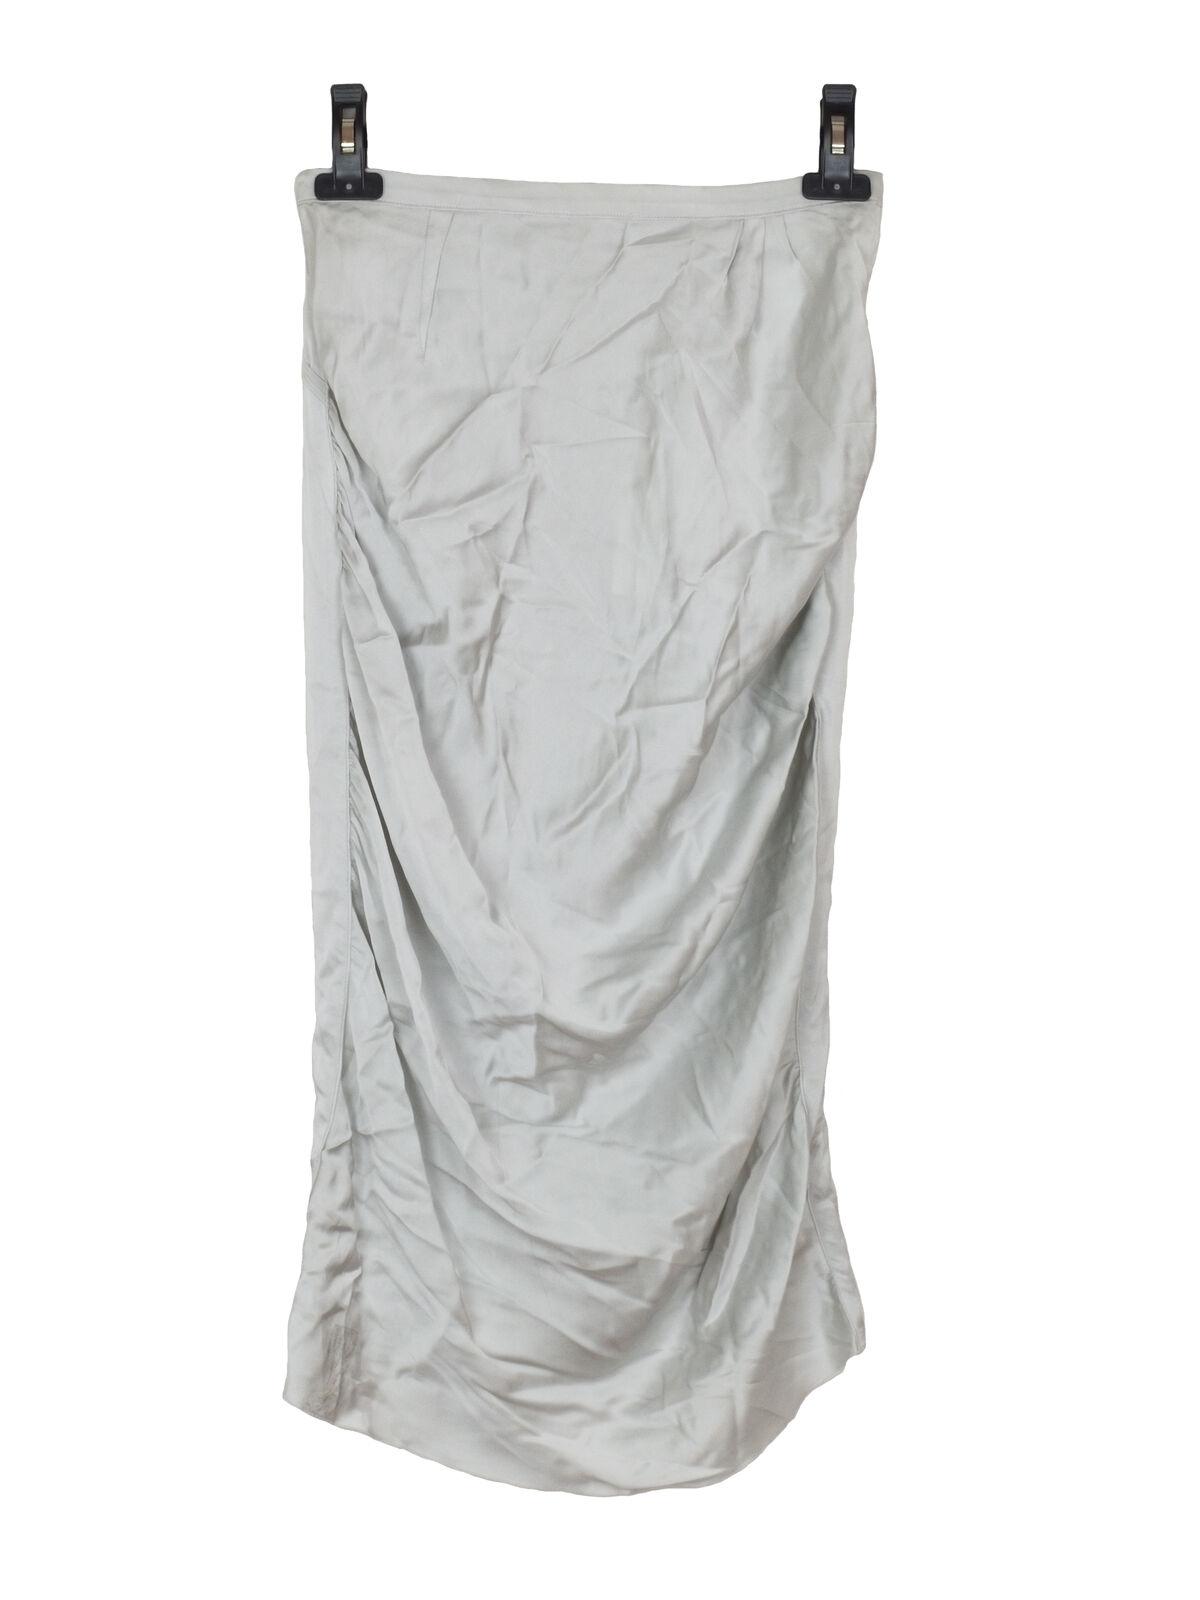 NEW Nina Ricci silk blend grey skirt